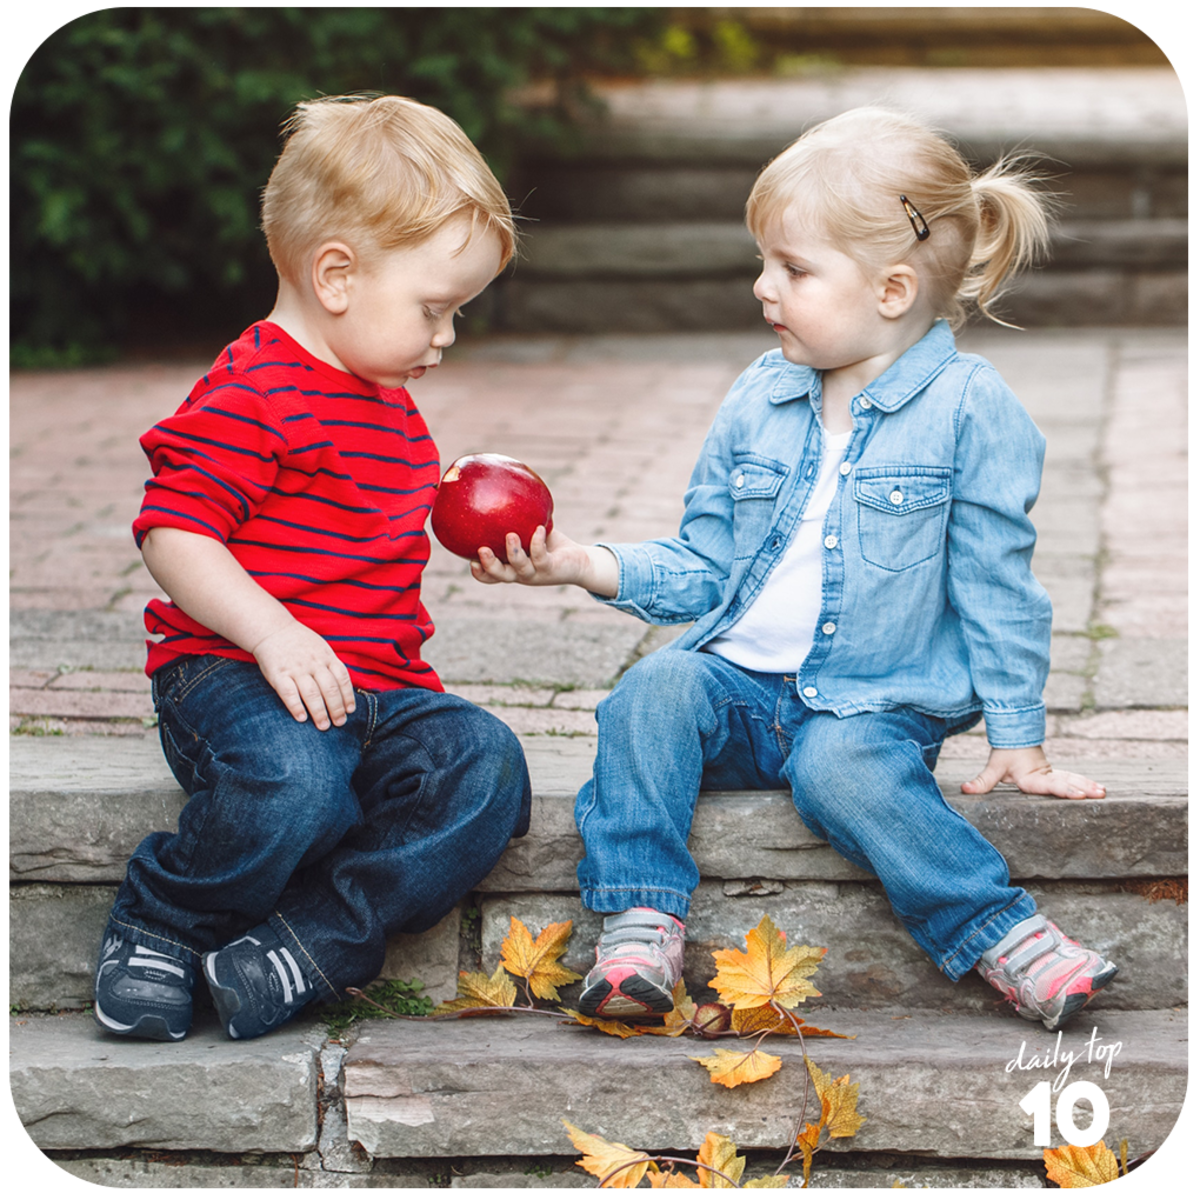 Share an apple and make a friend.